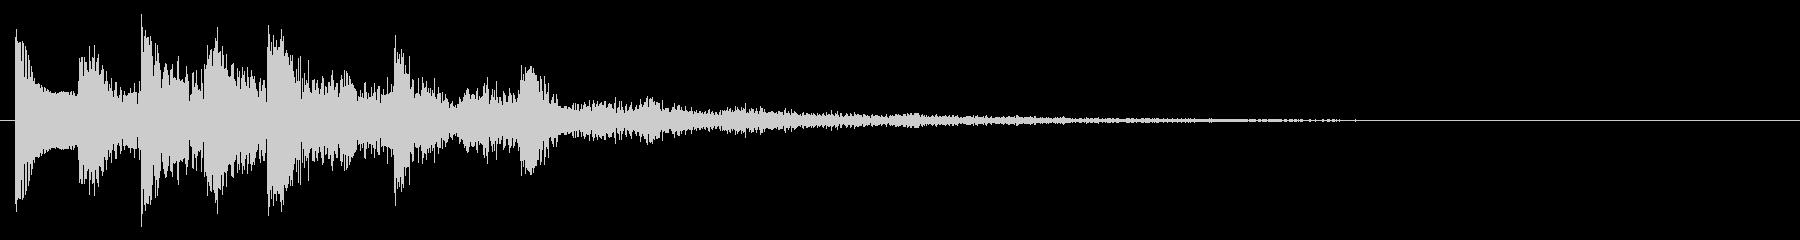 KANTベルサウンドジングル4の未再生の波形